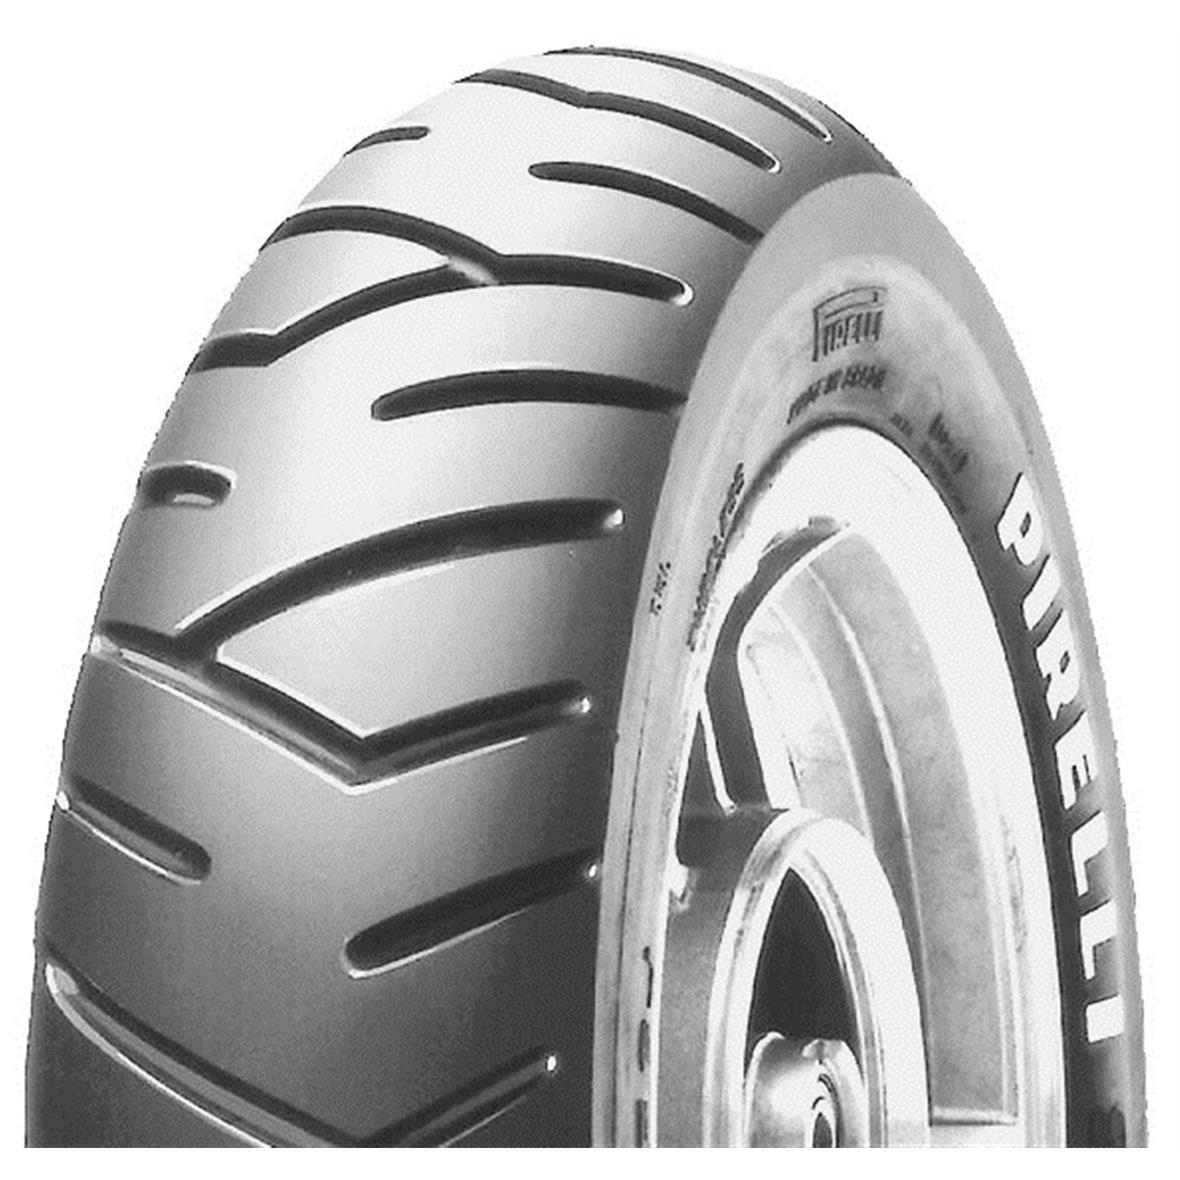 VESPA REIFEN Michelin S1 3.50-10 PX 80 125 150 200 GS T5 Sprint Rally GL GT SS